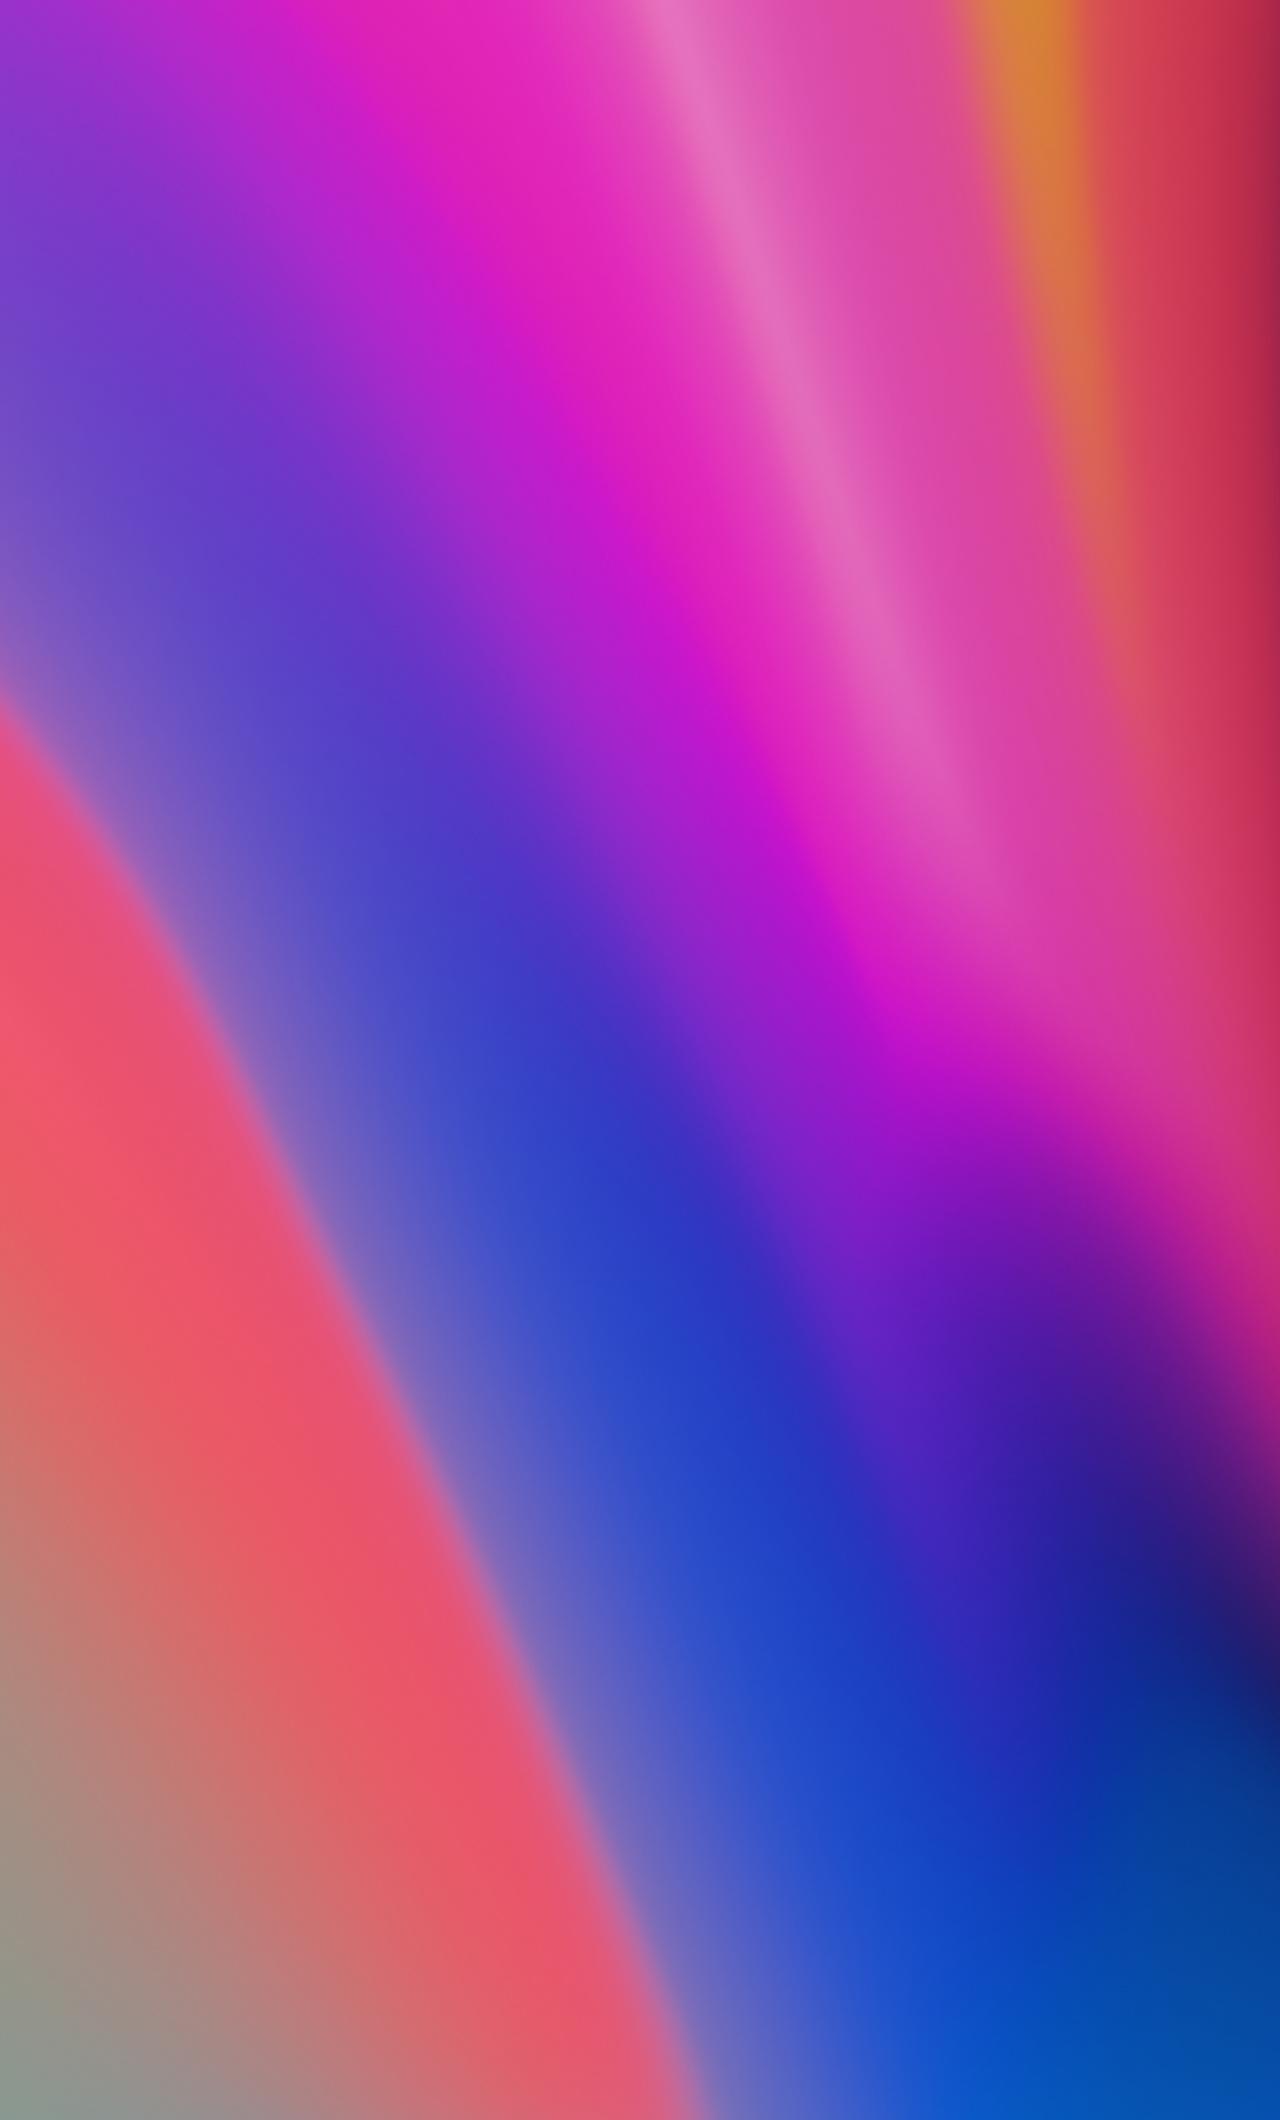 Downaload Gradients, Colorful, Creamy, Vivid Colors - Iphone Wallpaper 4k Colors , HD Wallpaper & Backgrounds